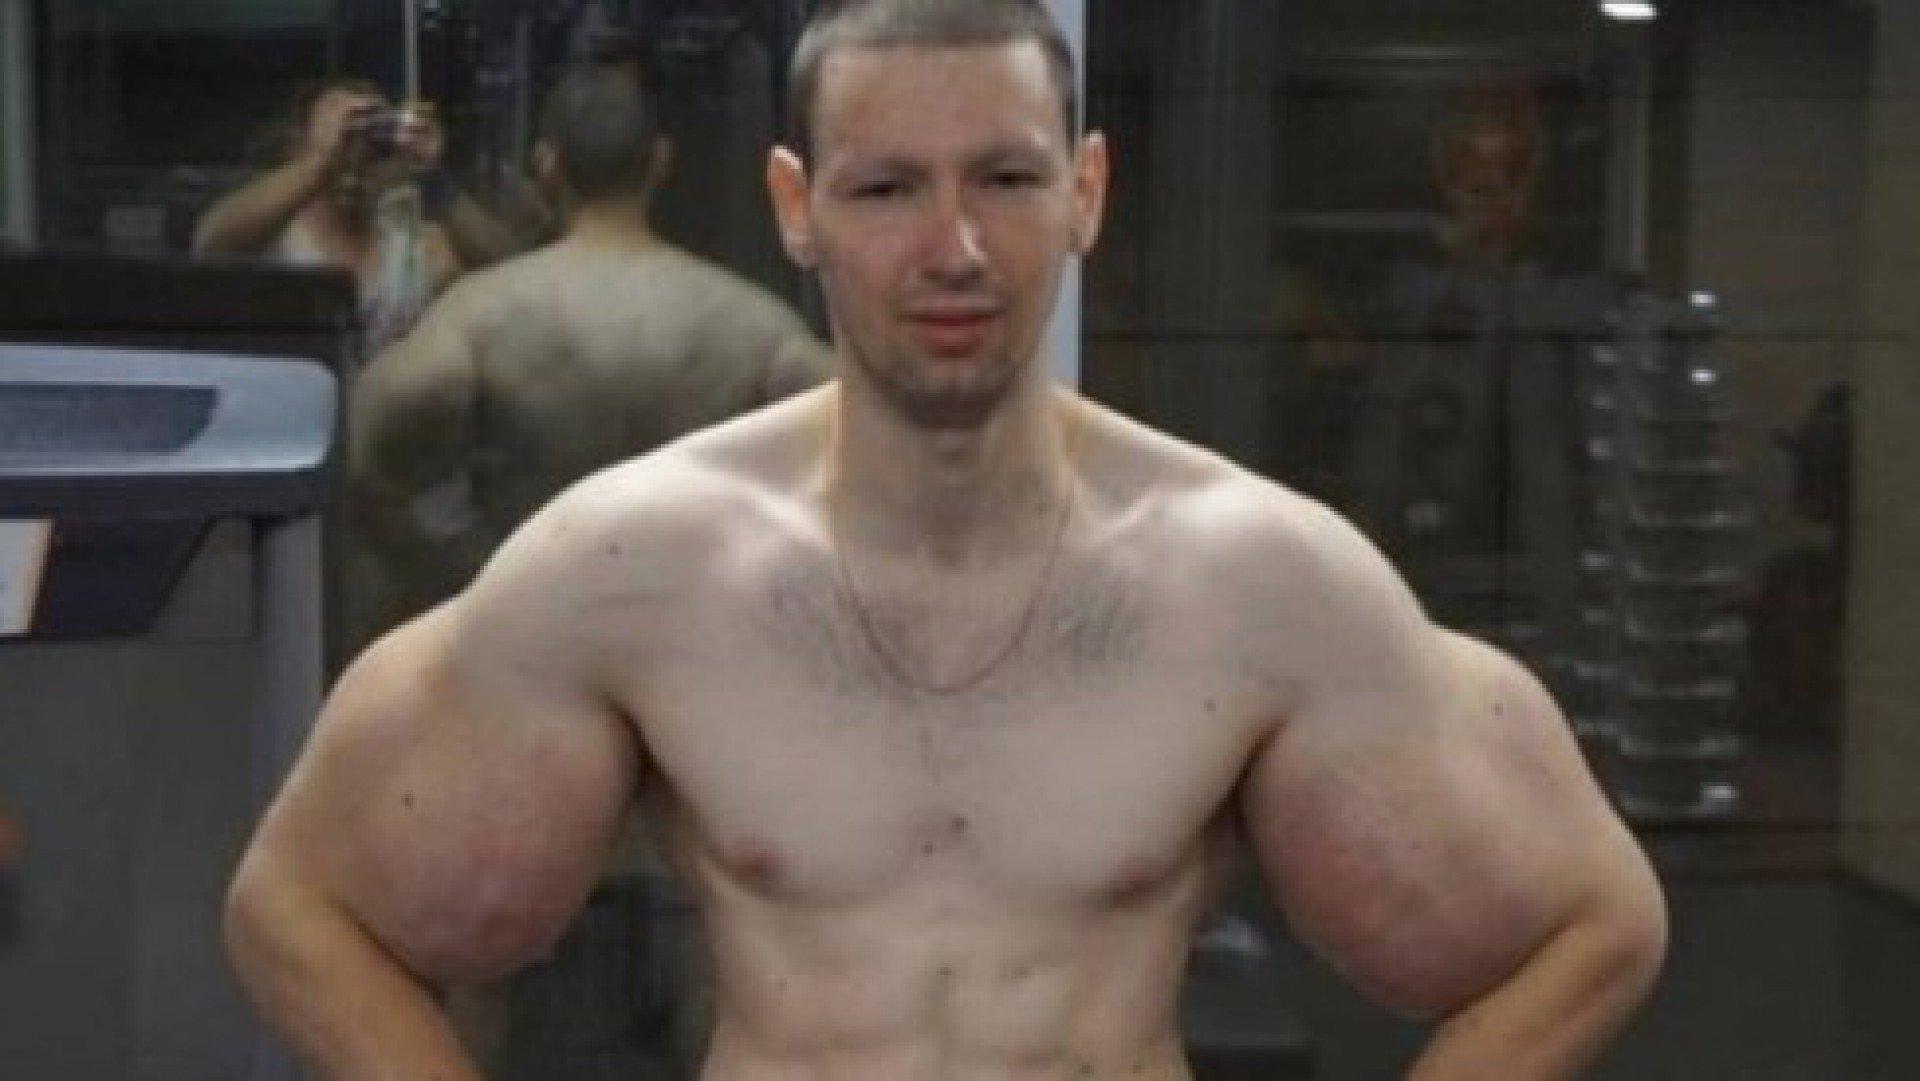 Bizarro! Bíceps de lutador 'explode' durante luta de MMA; veja o vídeo!